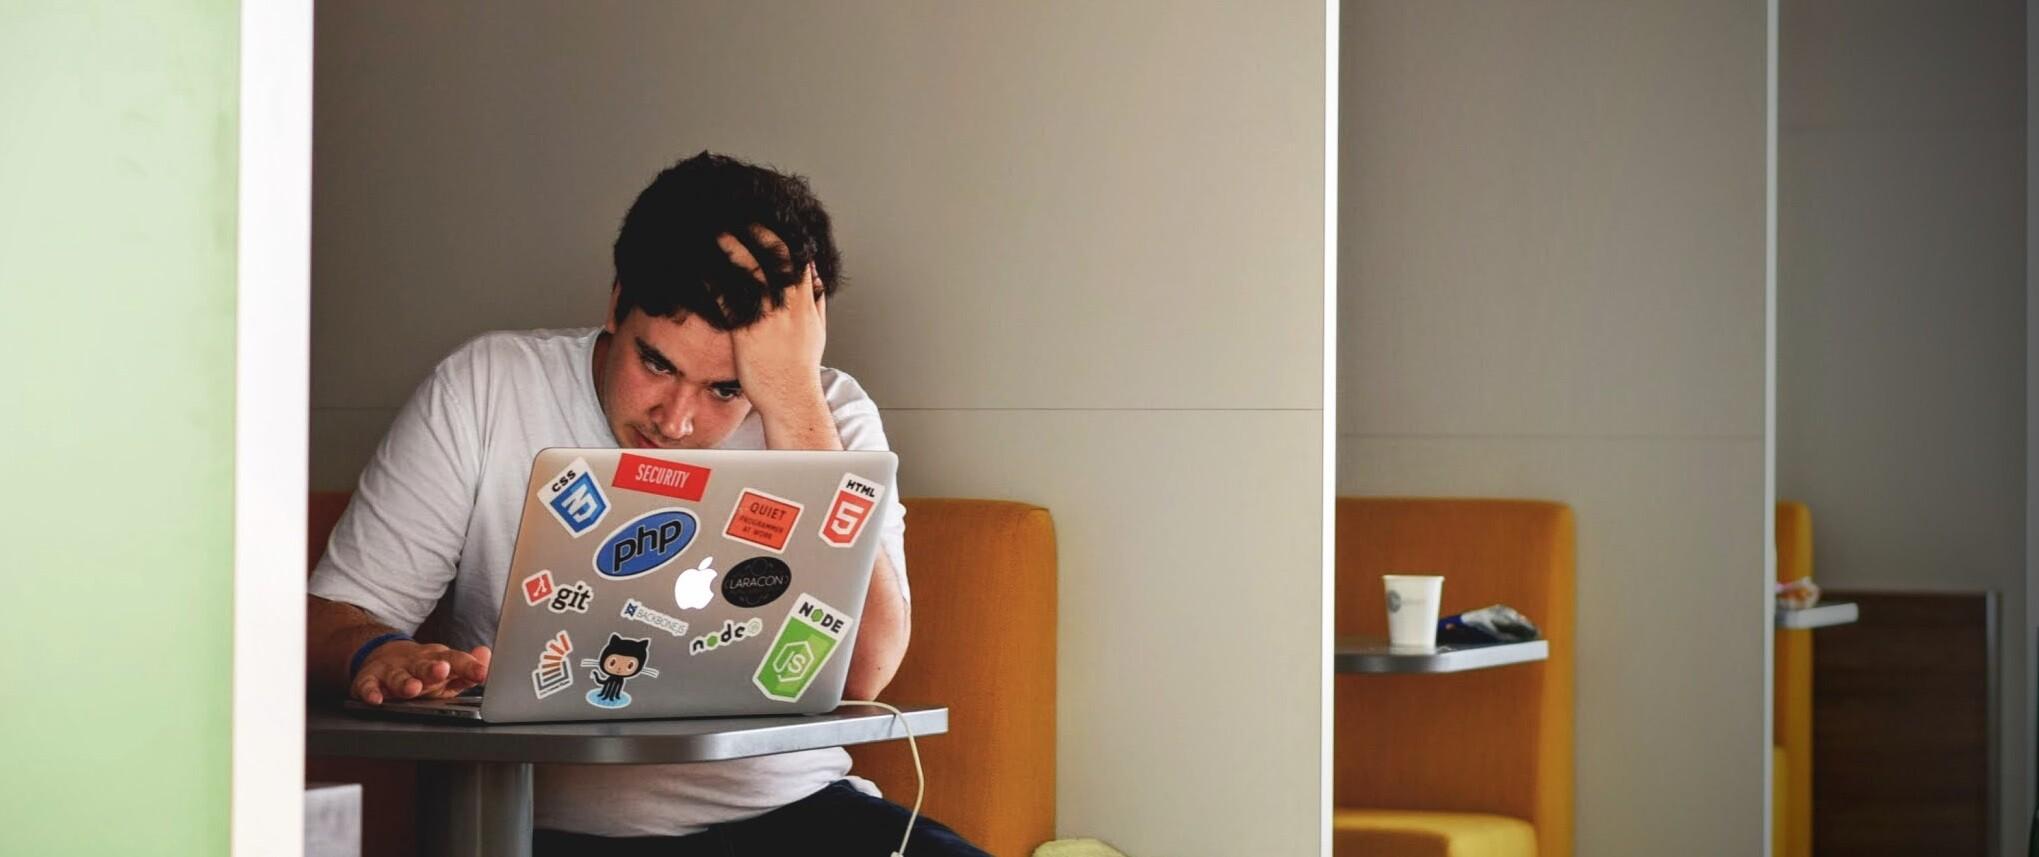 freelancer na crise